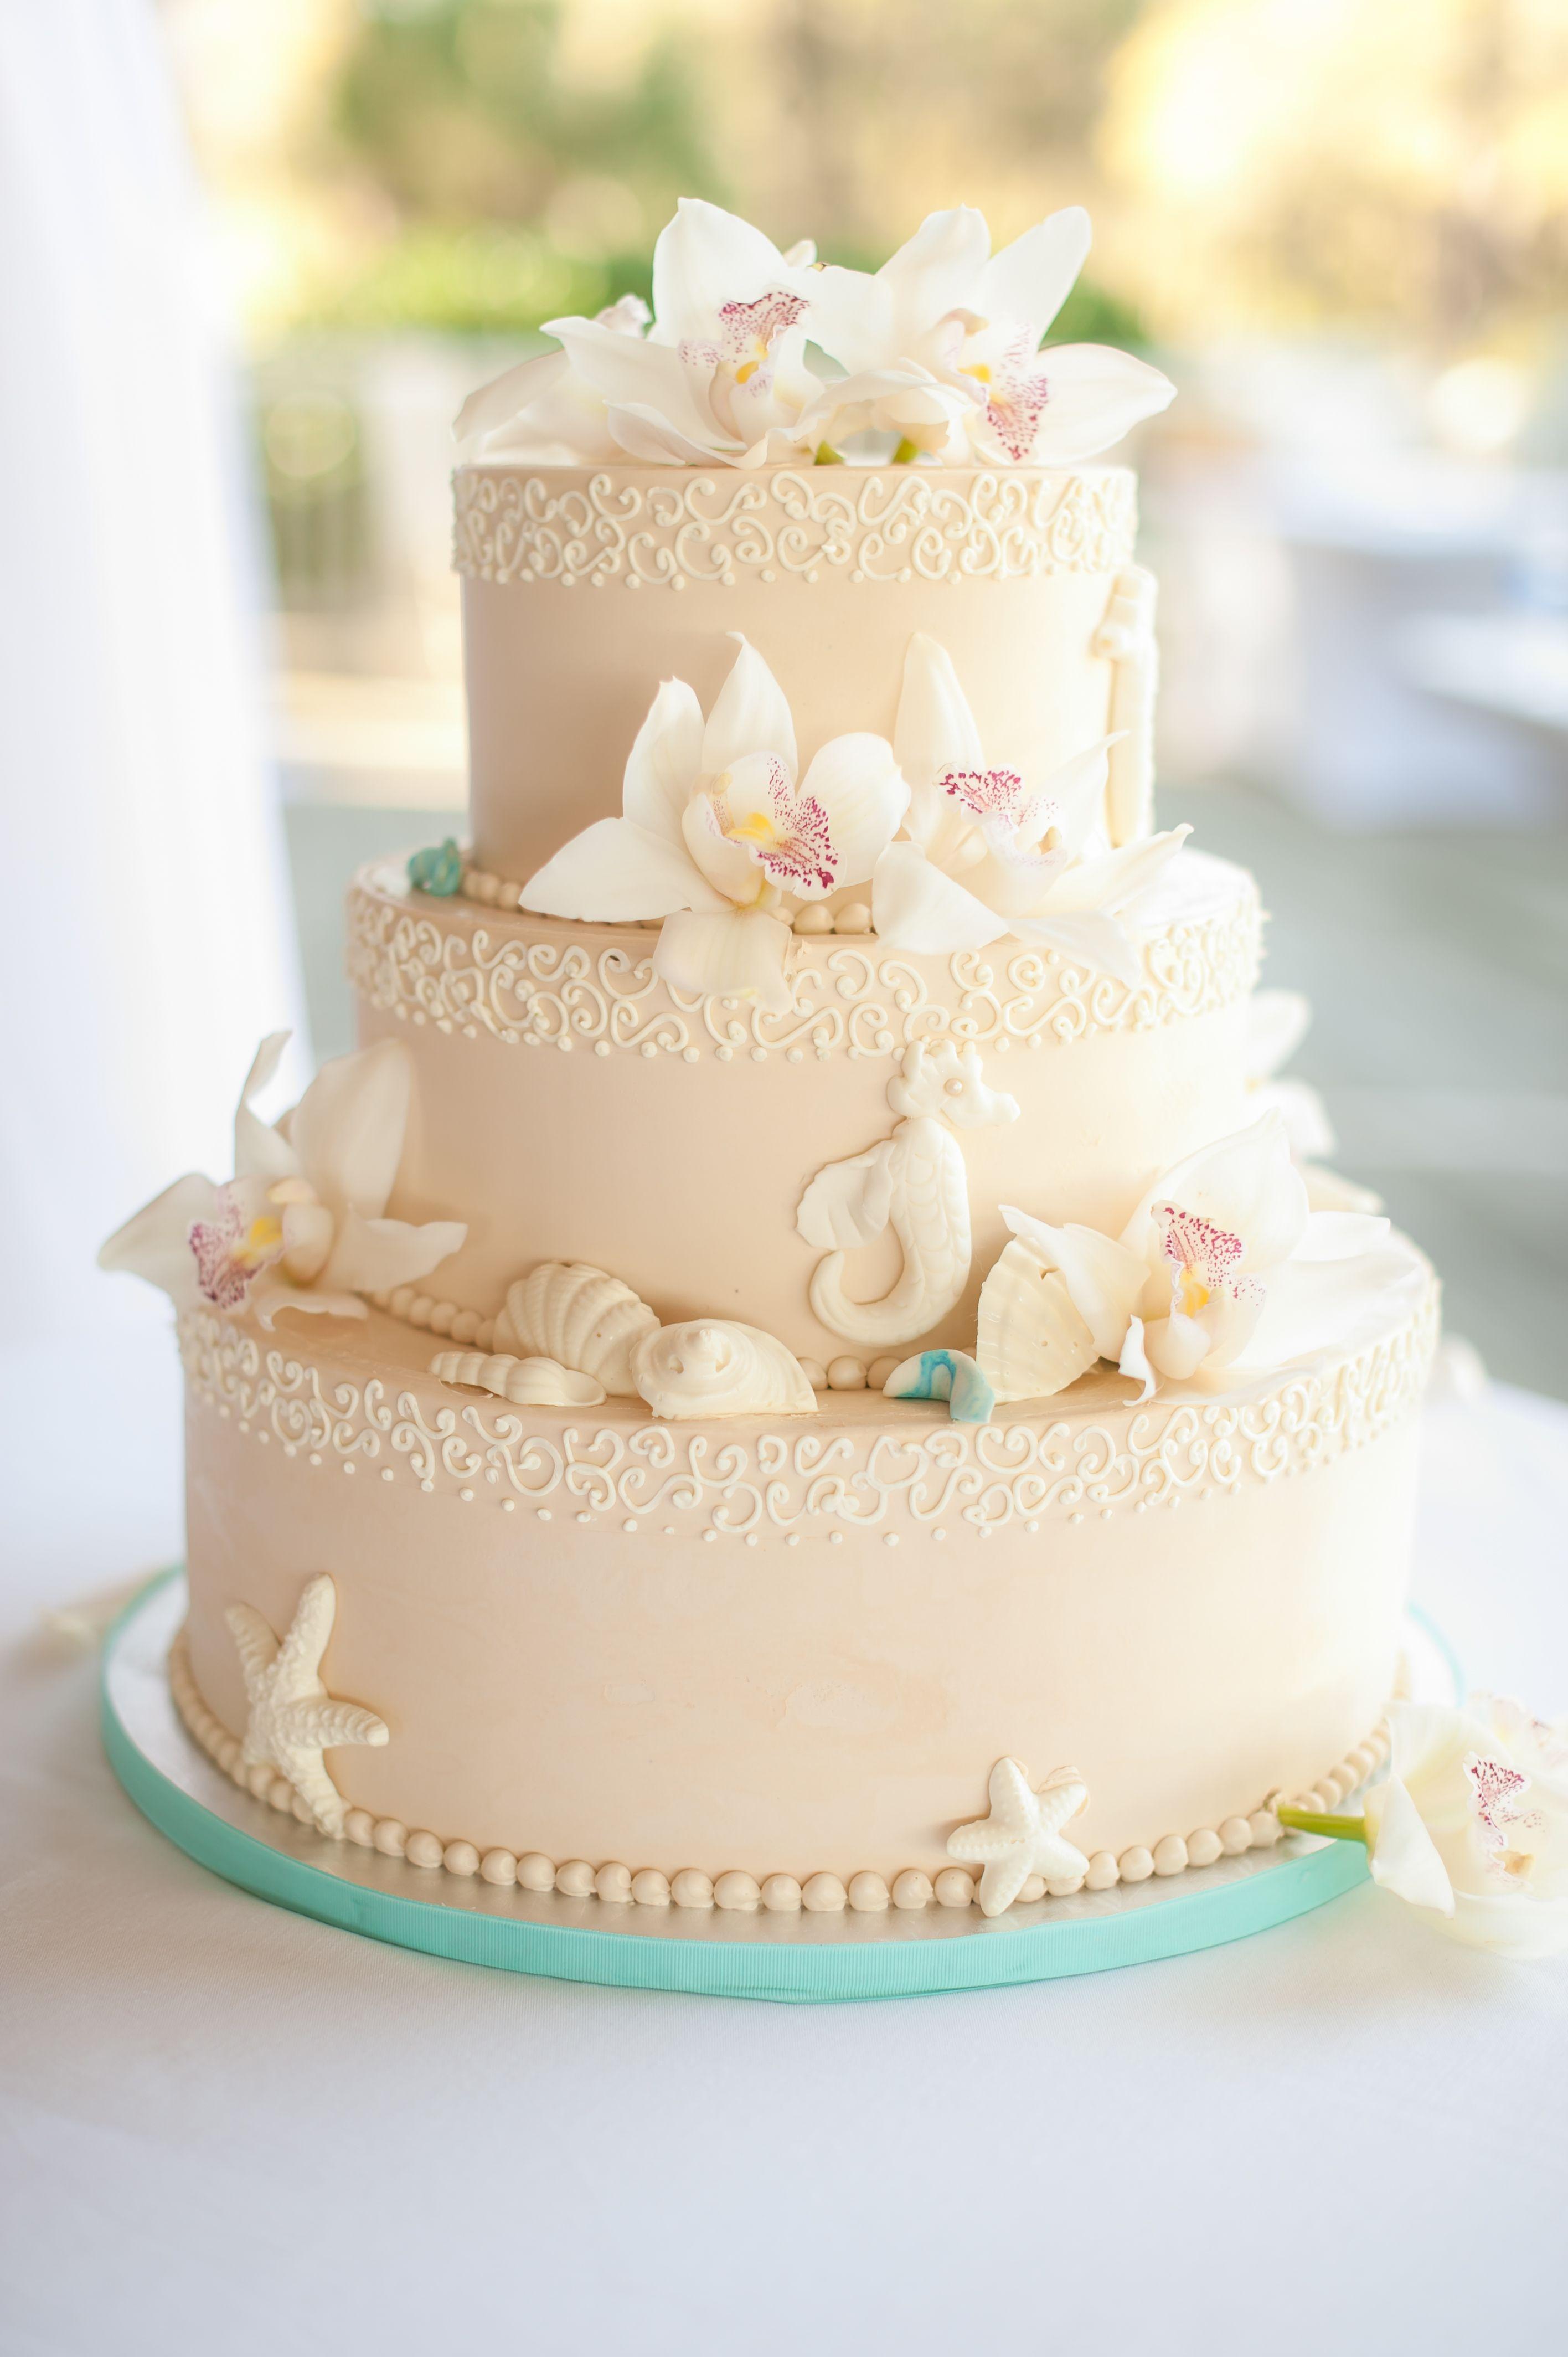 Beach Themed Wedding Cake With Seashells And Seahorses Wedding